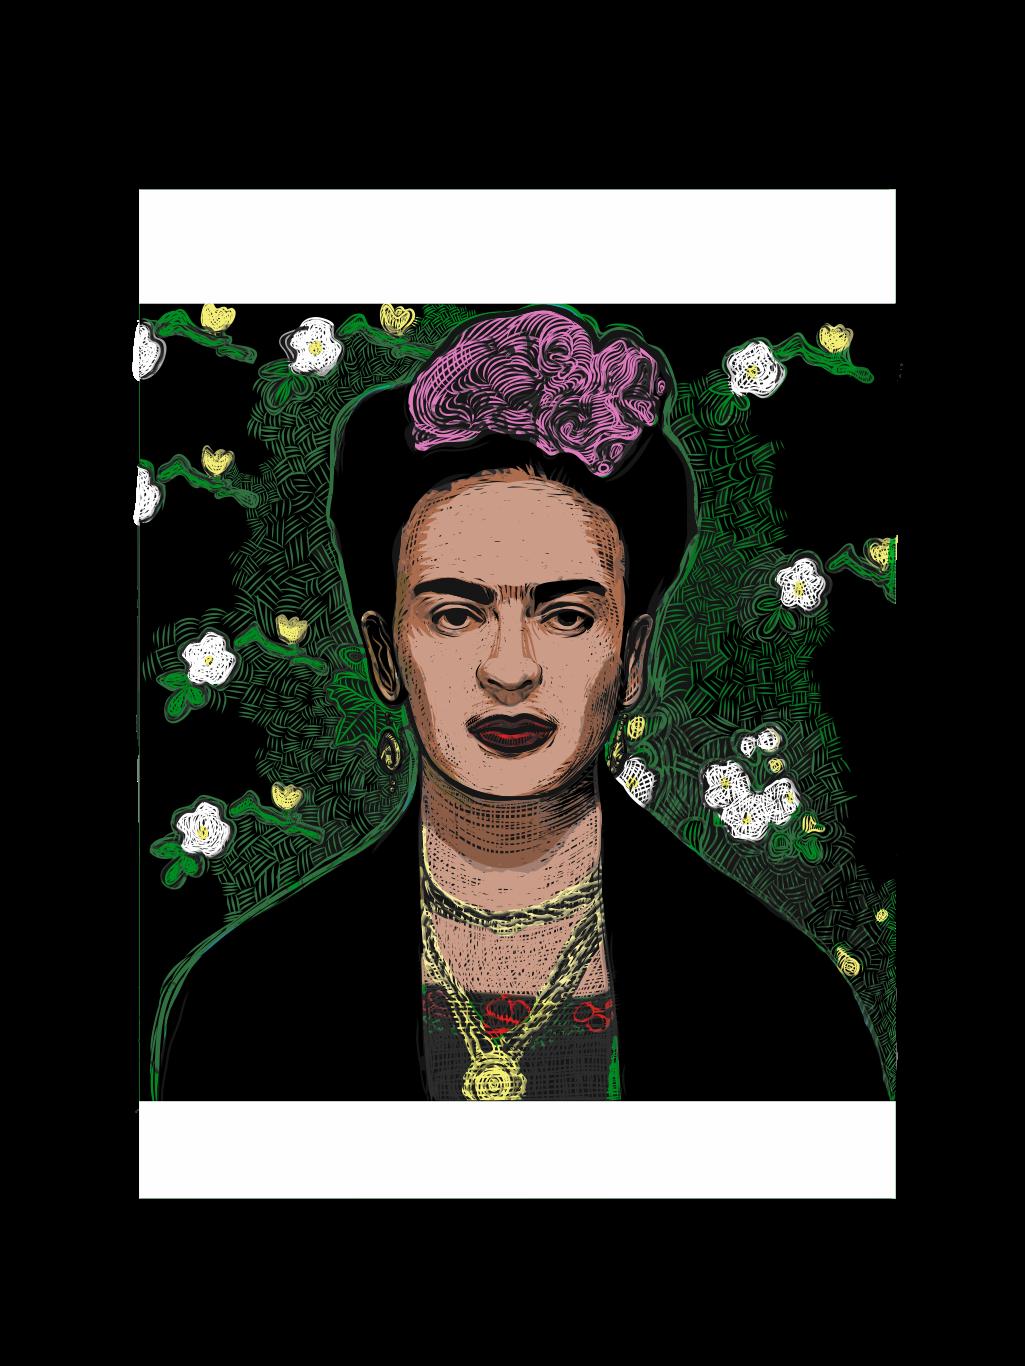 adobedraw frida artist hispanic feminist portrait vector art mexico kahlo diego rivera